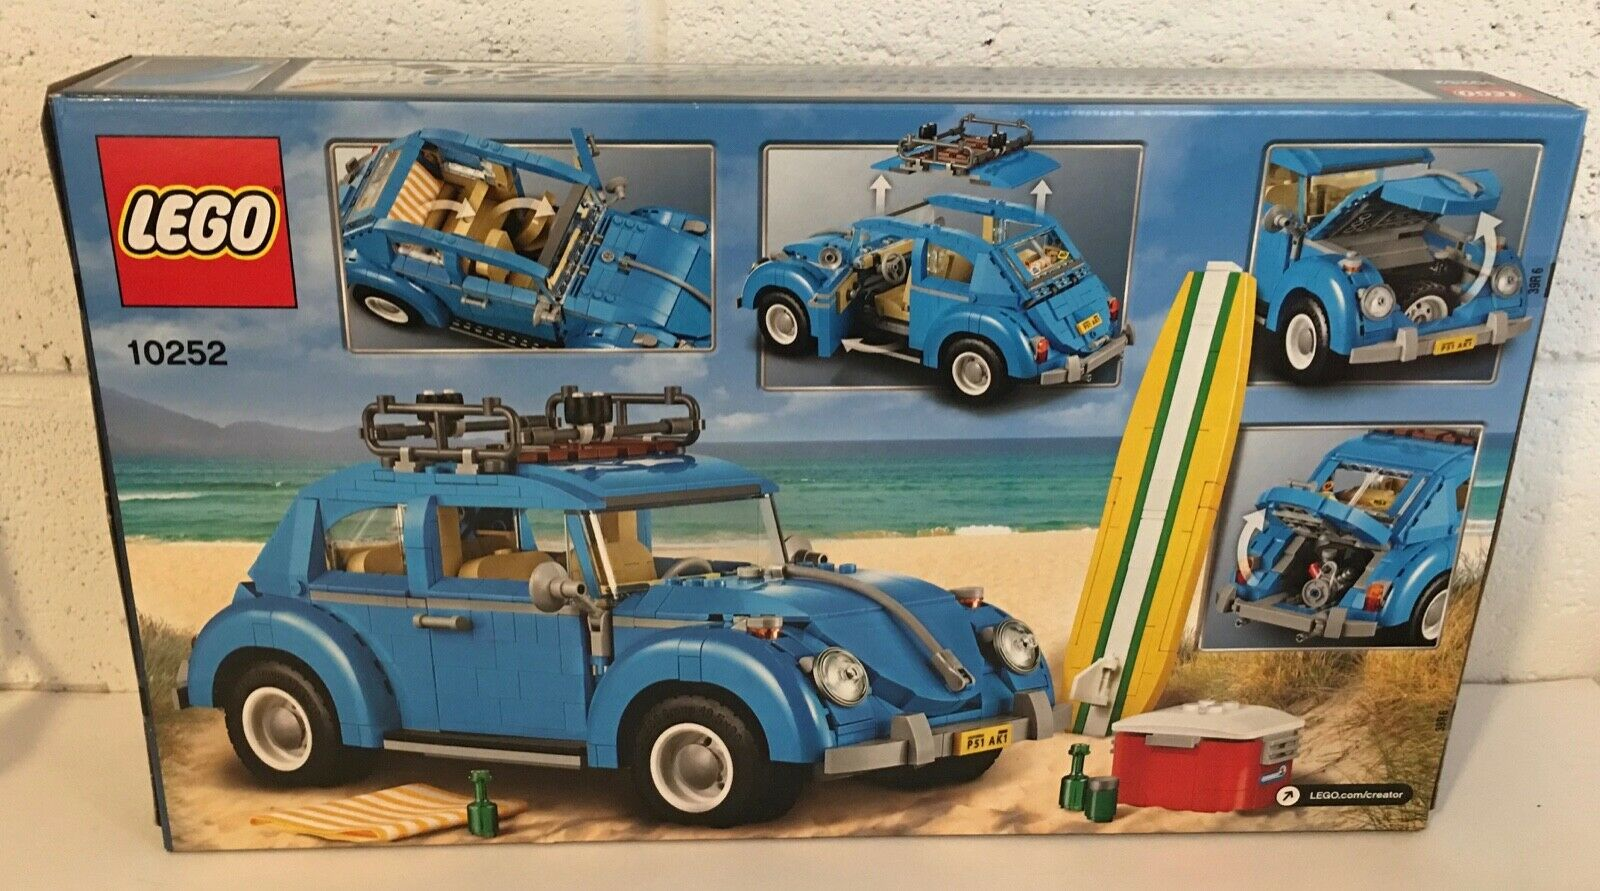 LEGO Creator Expert Volkswagen Beetle 10252 Bldg.Kit NEW in factory sealed box